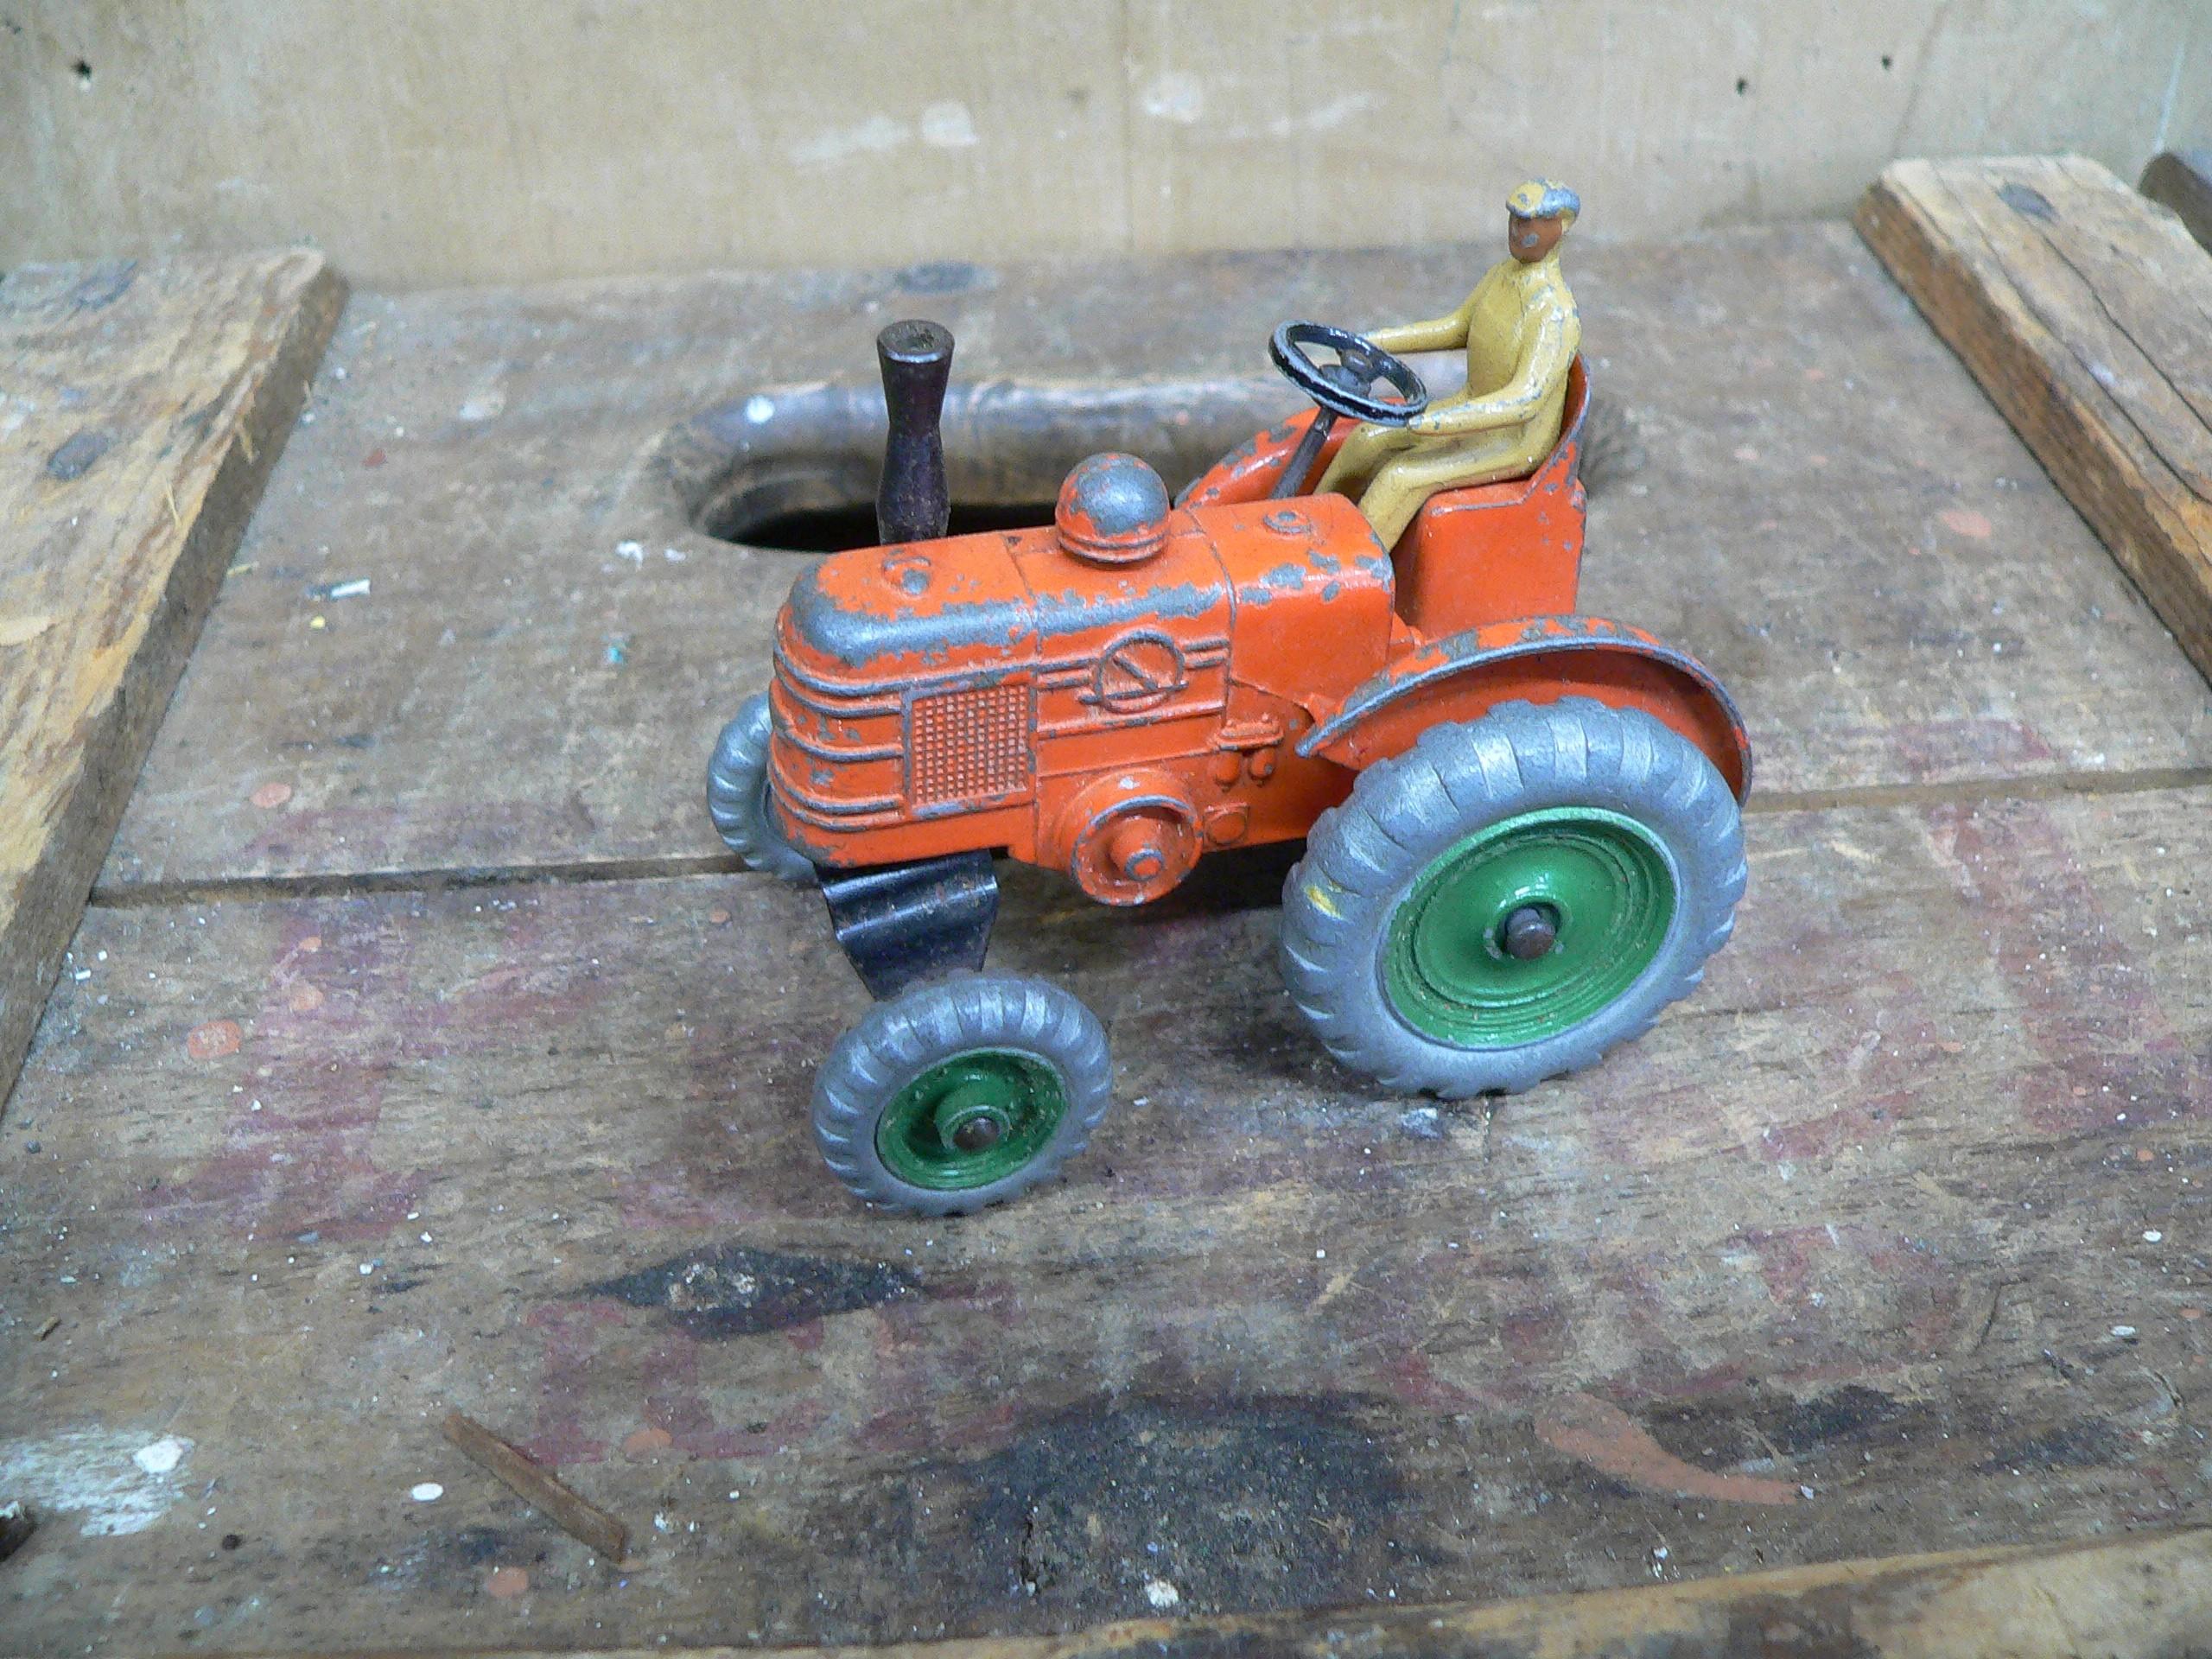 Field marshall tractor # 5923.15